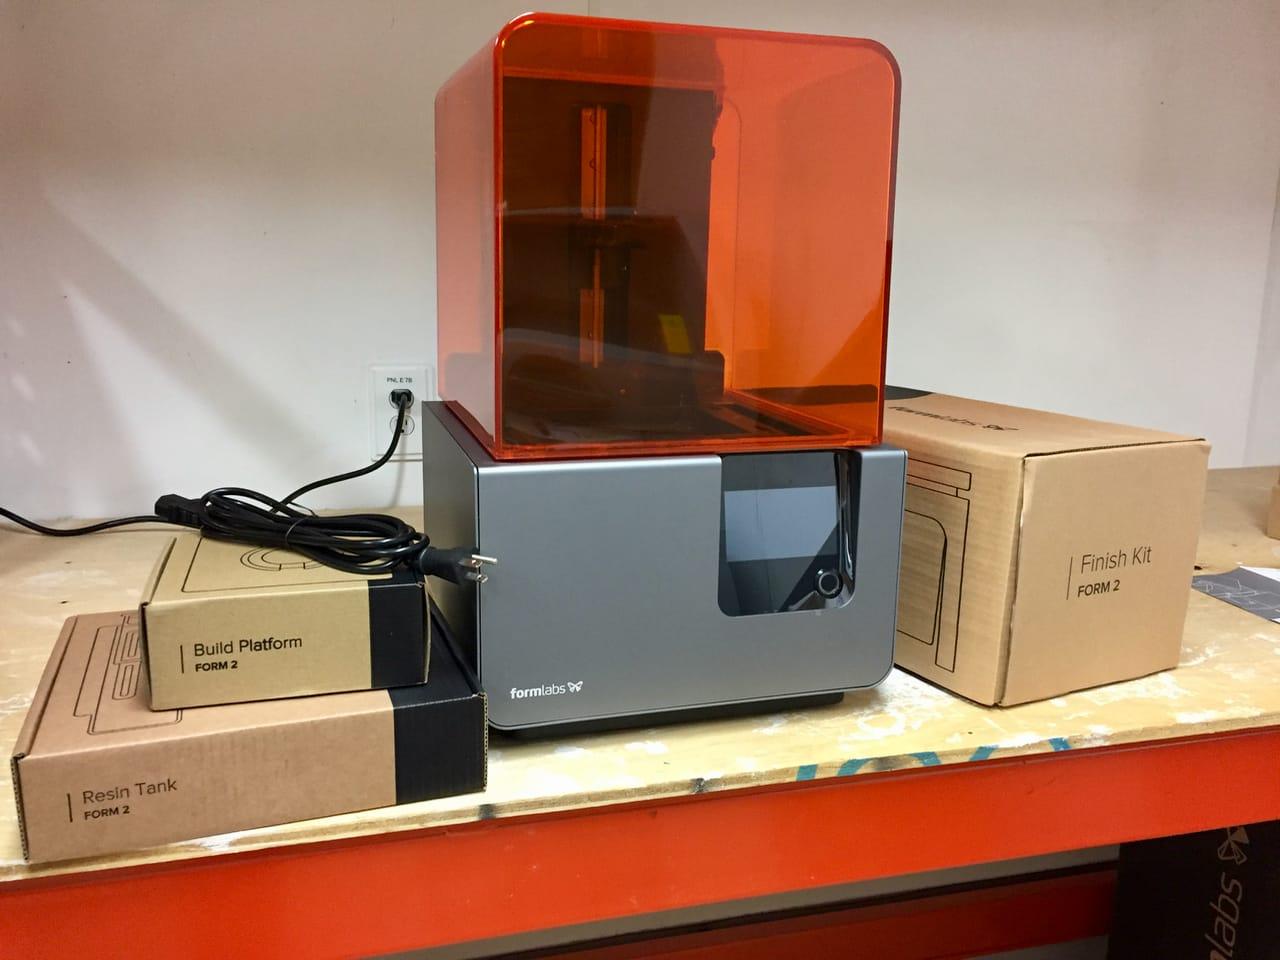 Hands on with the Form 2 Desktop 3D Printer, Part 1